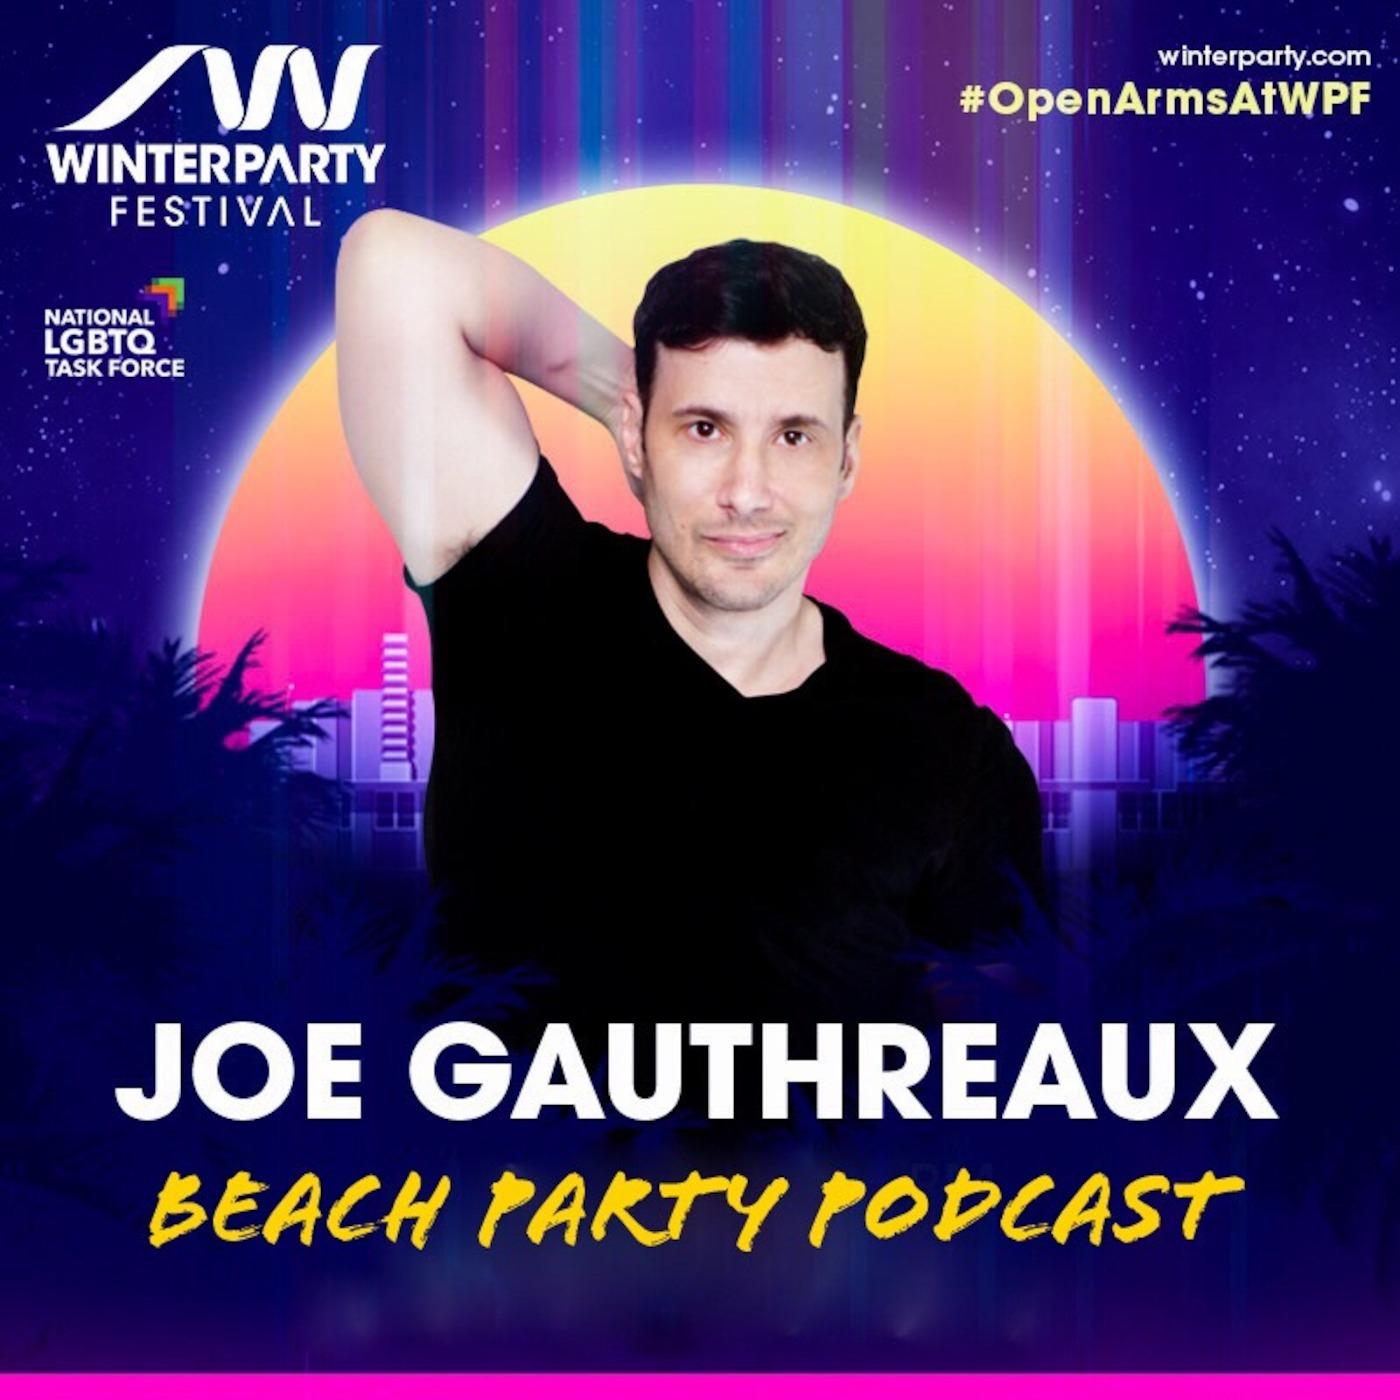 JOE GAUTHREAUX Official Podcast